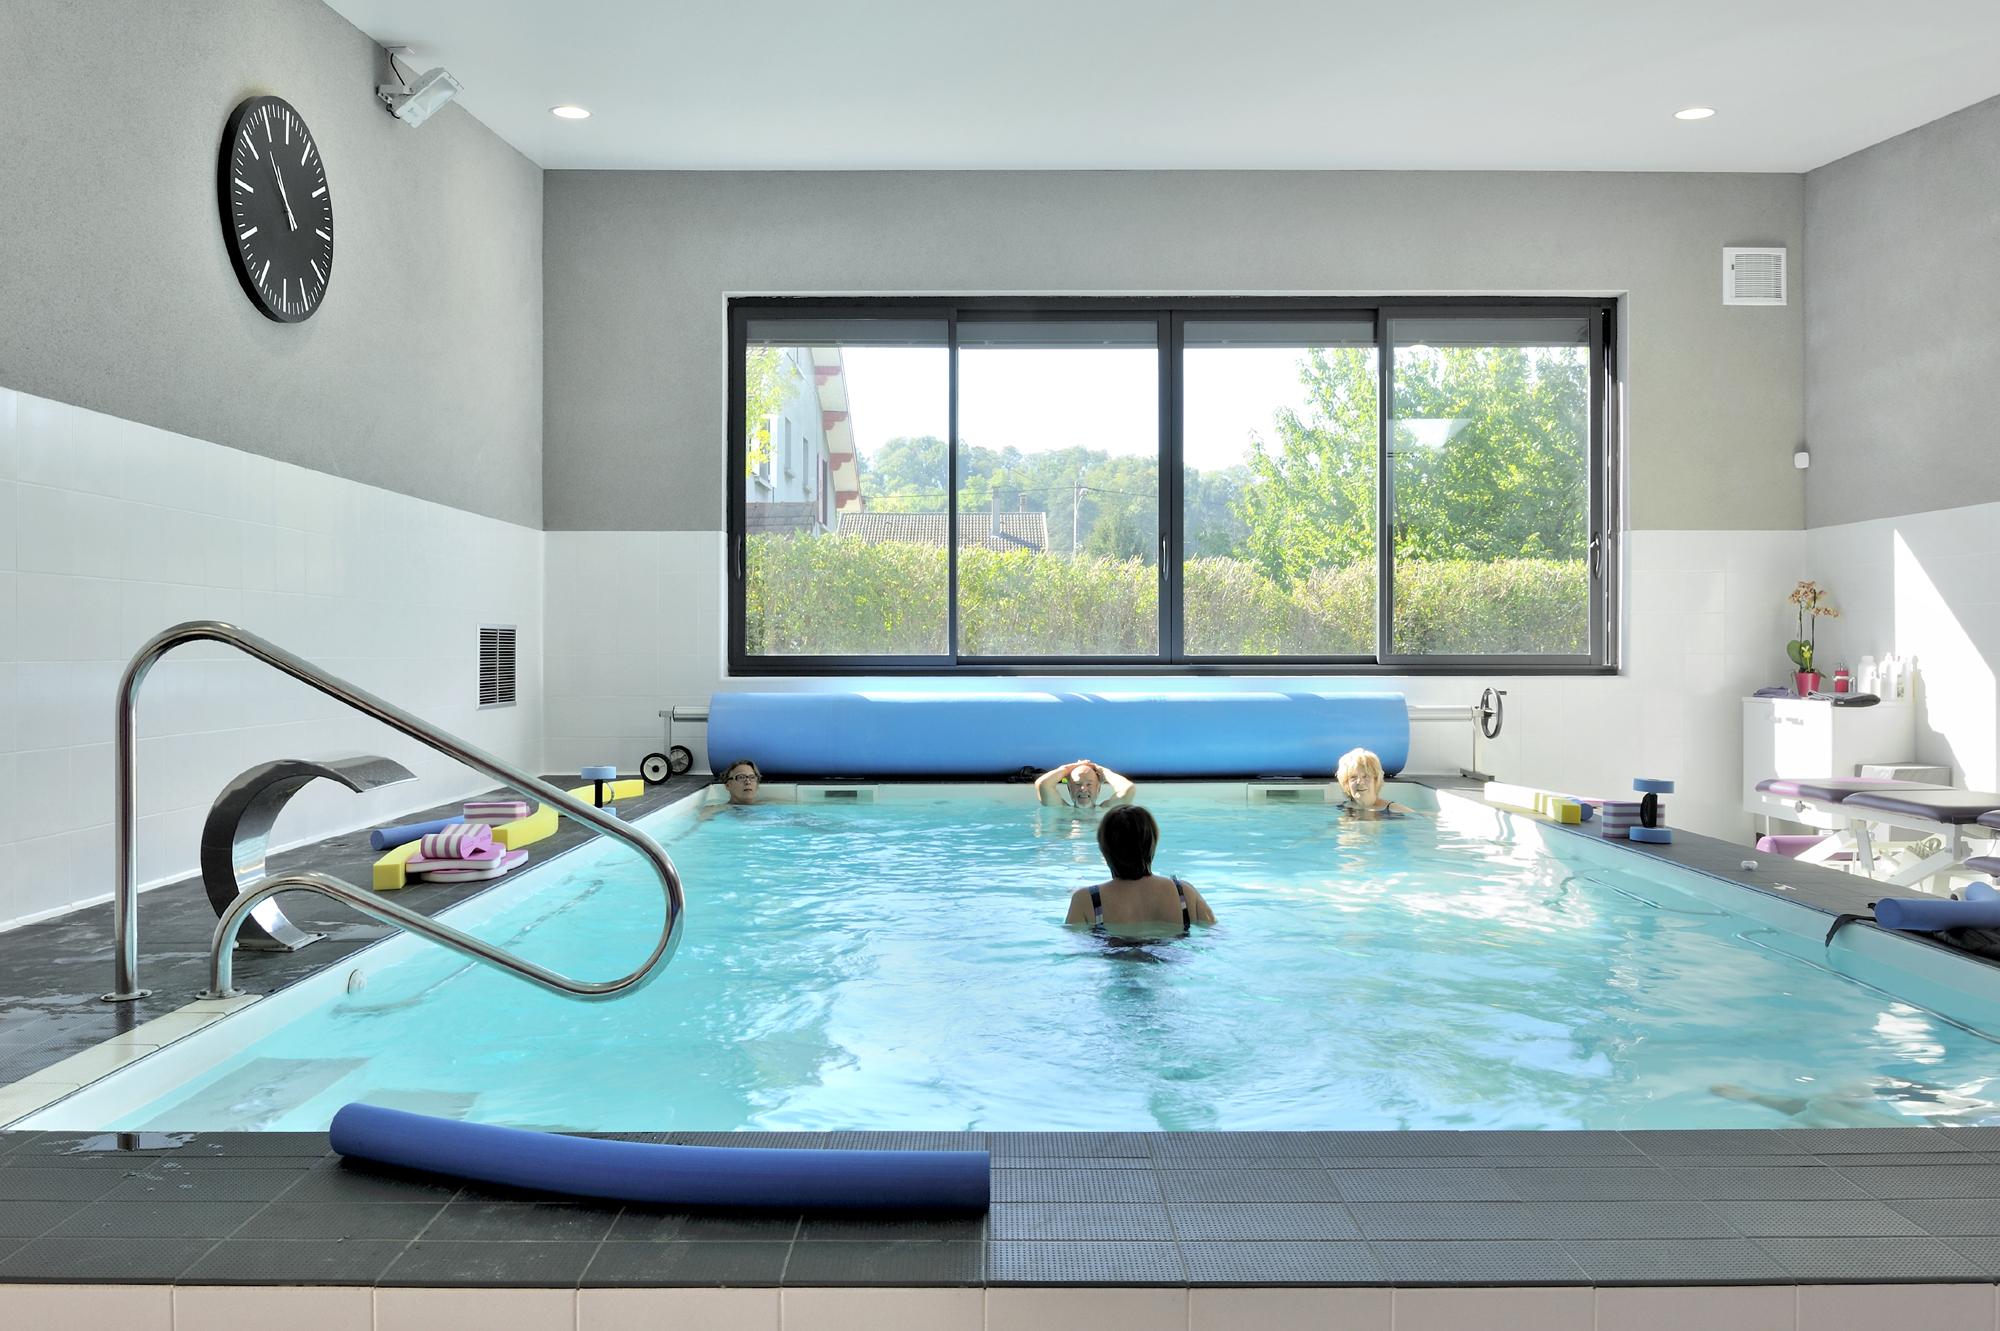 D co piscine contemporaine lyon 33 marseille piscine for Piscine 5575